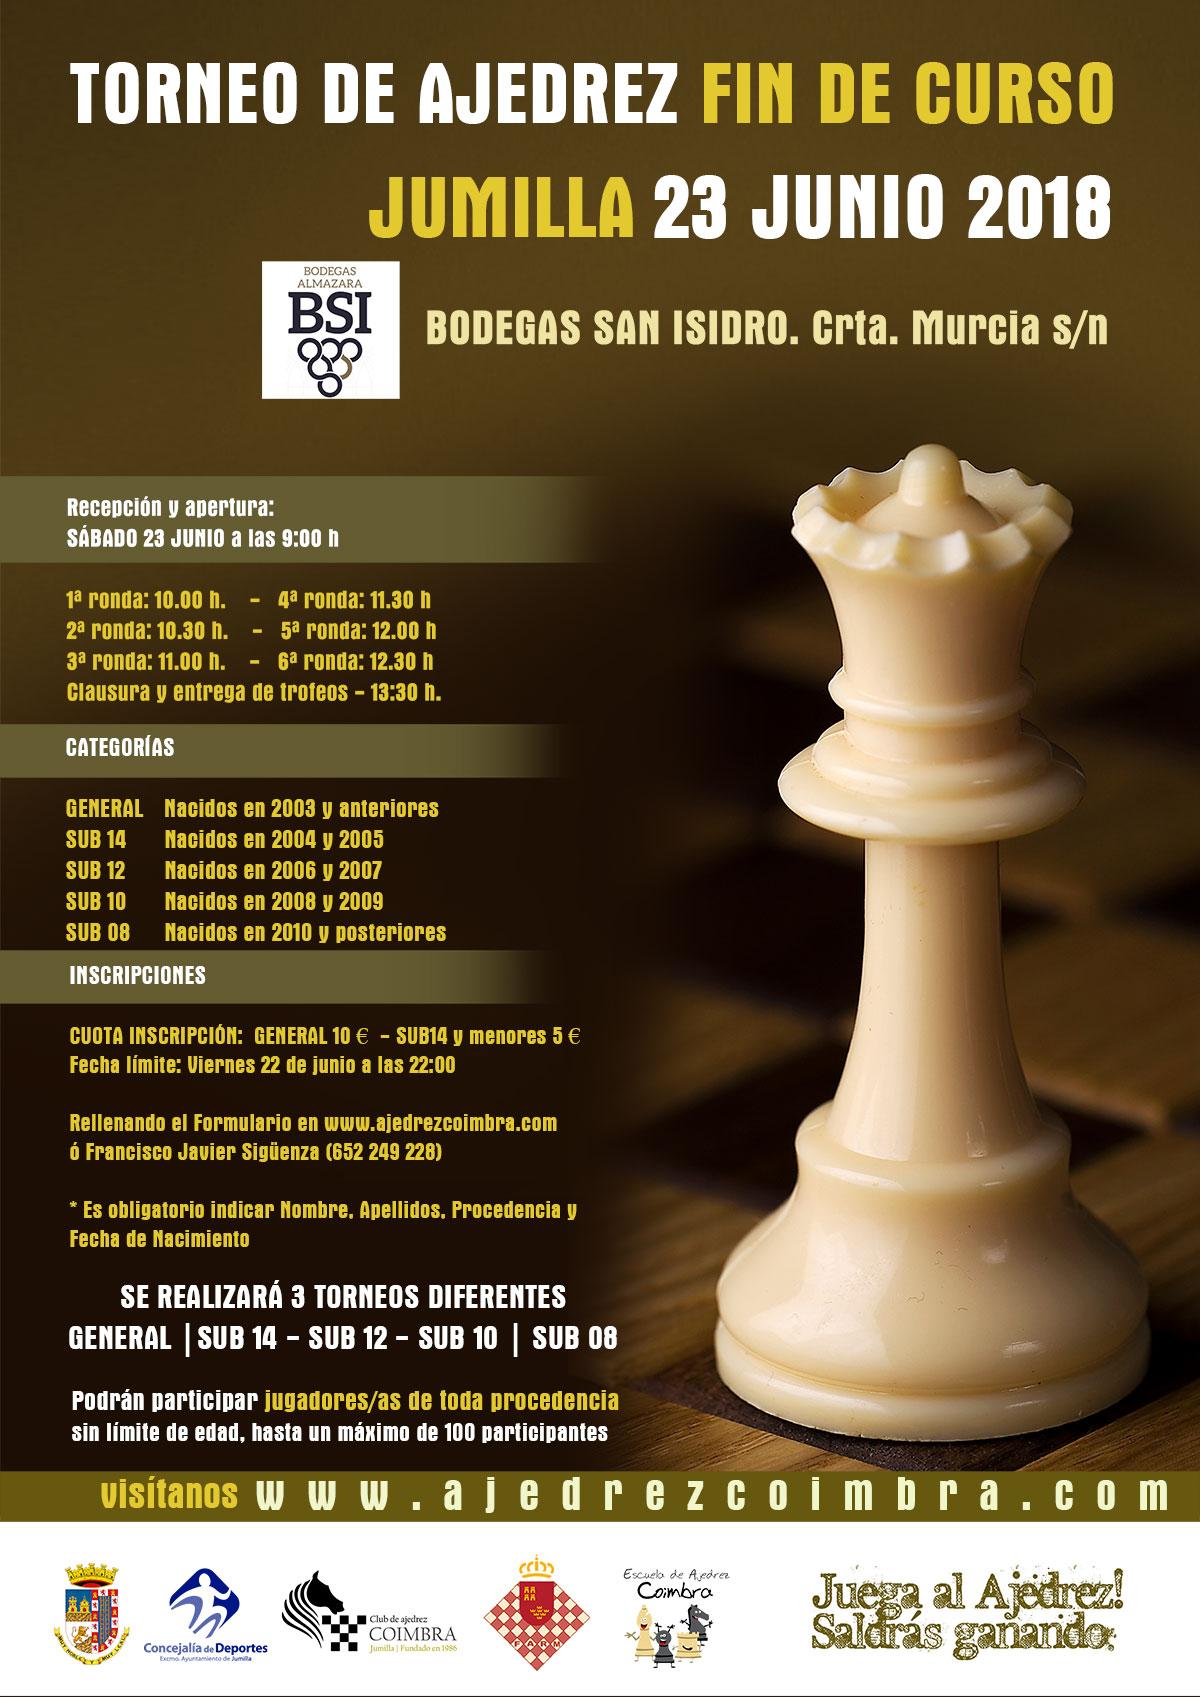 "Torneo de Ajedrez Fin de Curso Jumilla «23 Junio 2018» <img border=""0"" src=""https://3.bp.blogspot.com/-y_aaU0FTncM/V0APF_0MnxI/AAAAAAAAsi8/QfB3r4uk_BAcFSYADUEQAk_lwedJf-ujACKgB/s1600/recomendado.png"" />"